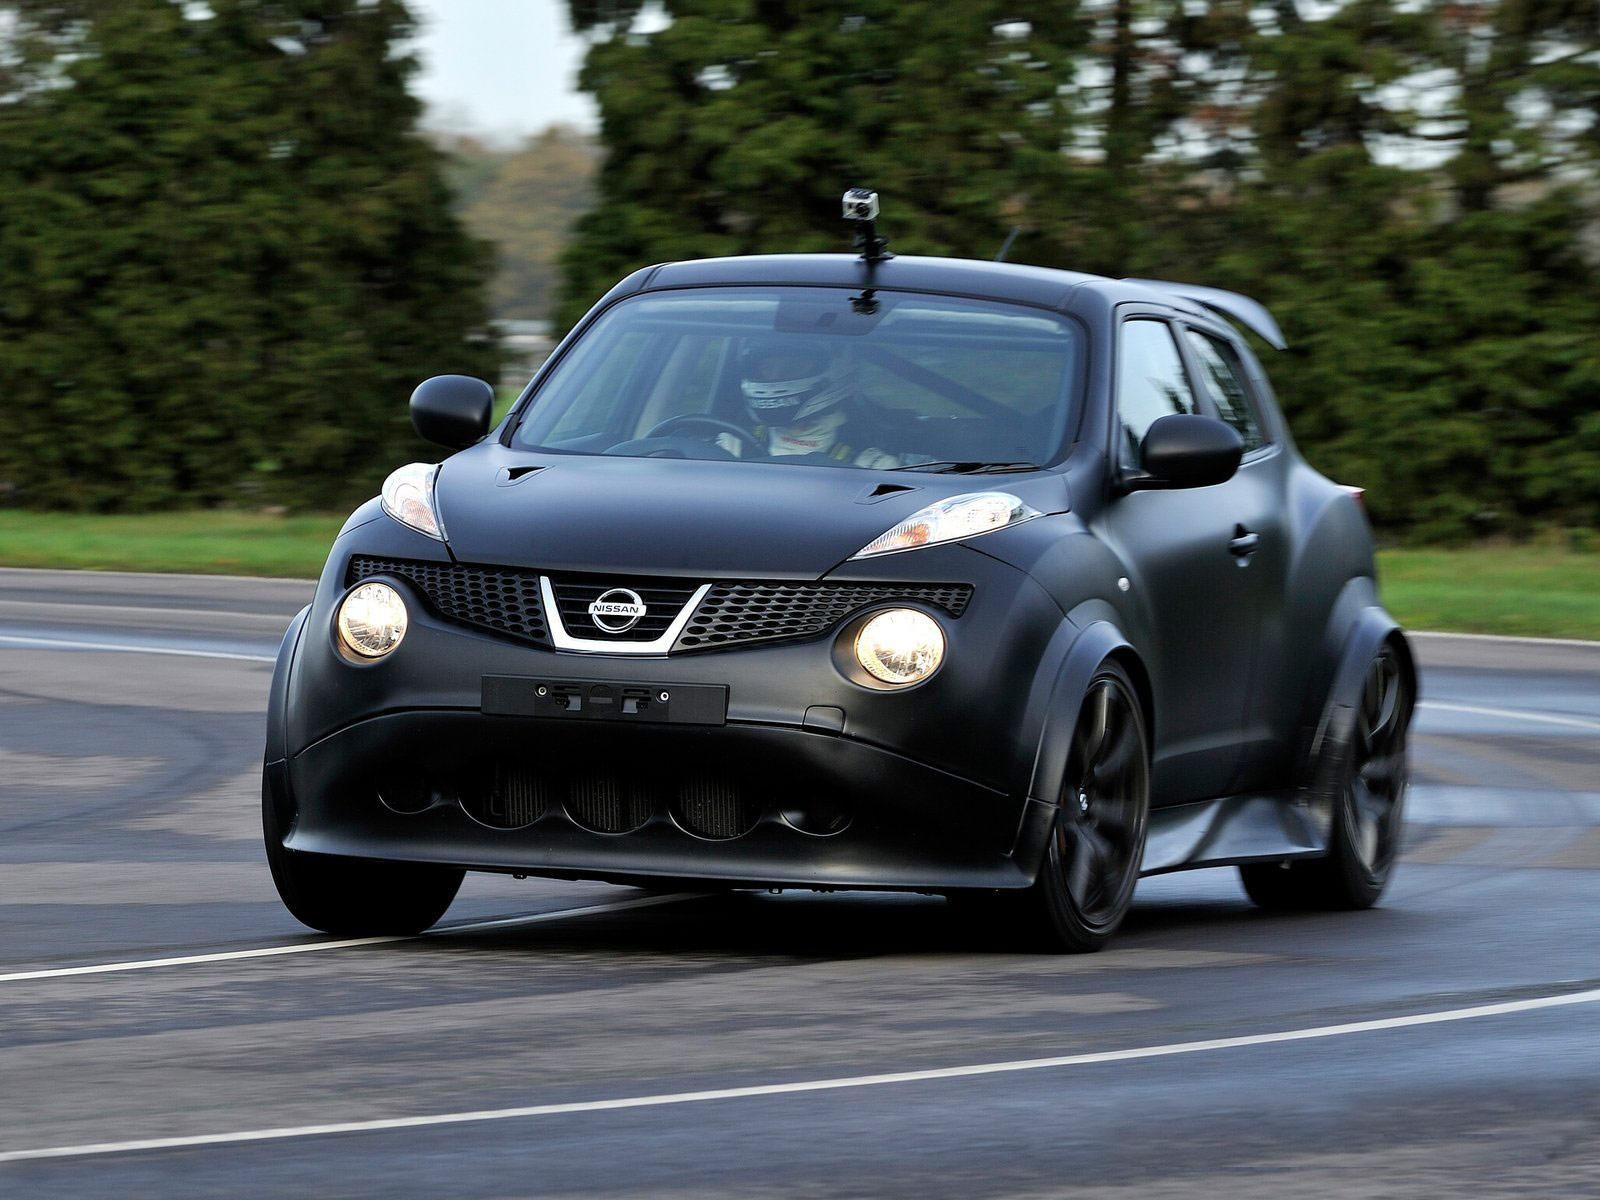 2011 Nissan Juke R Concept Japanese Car Photos